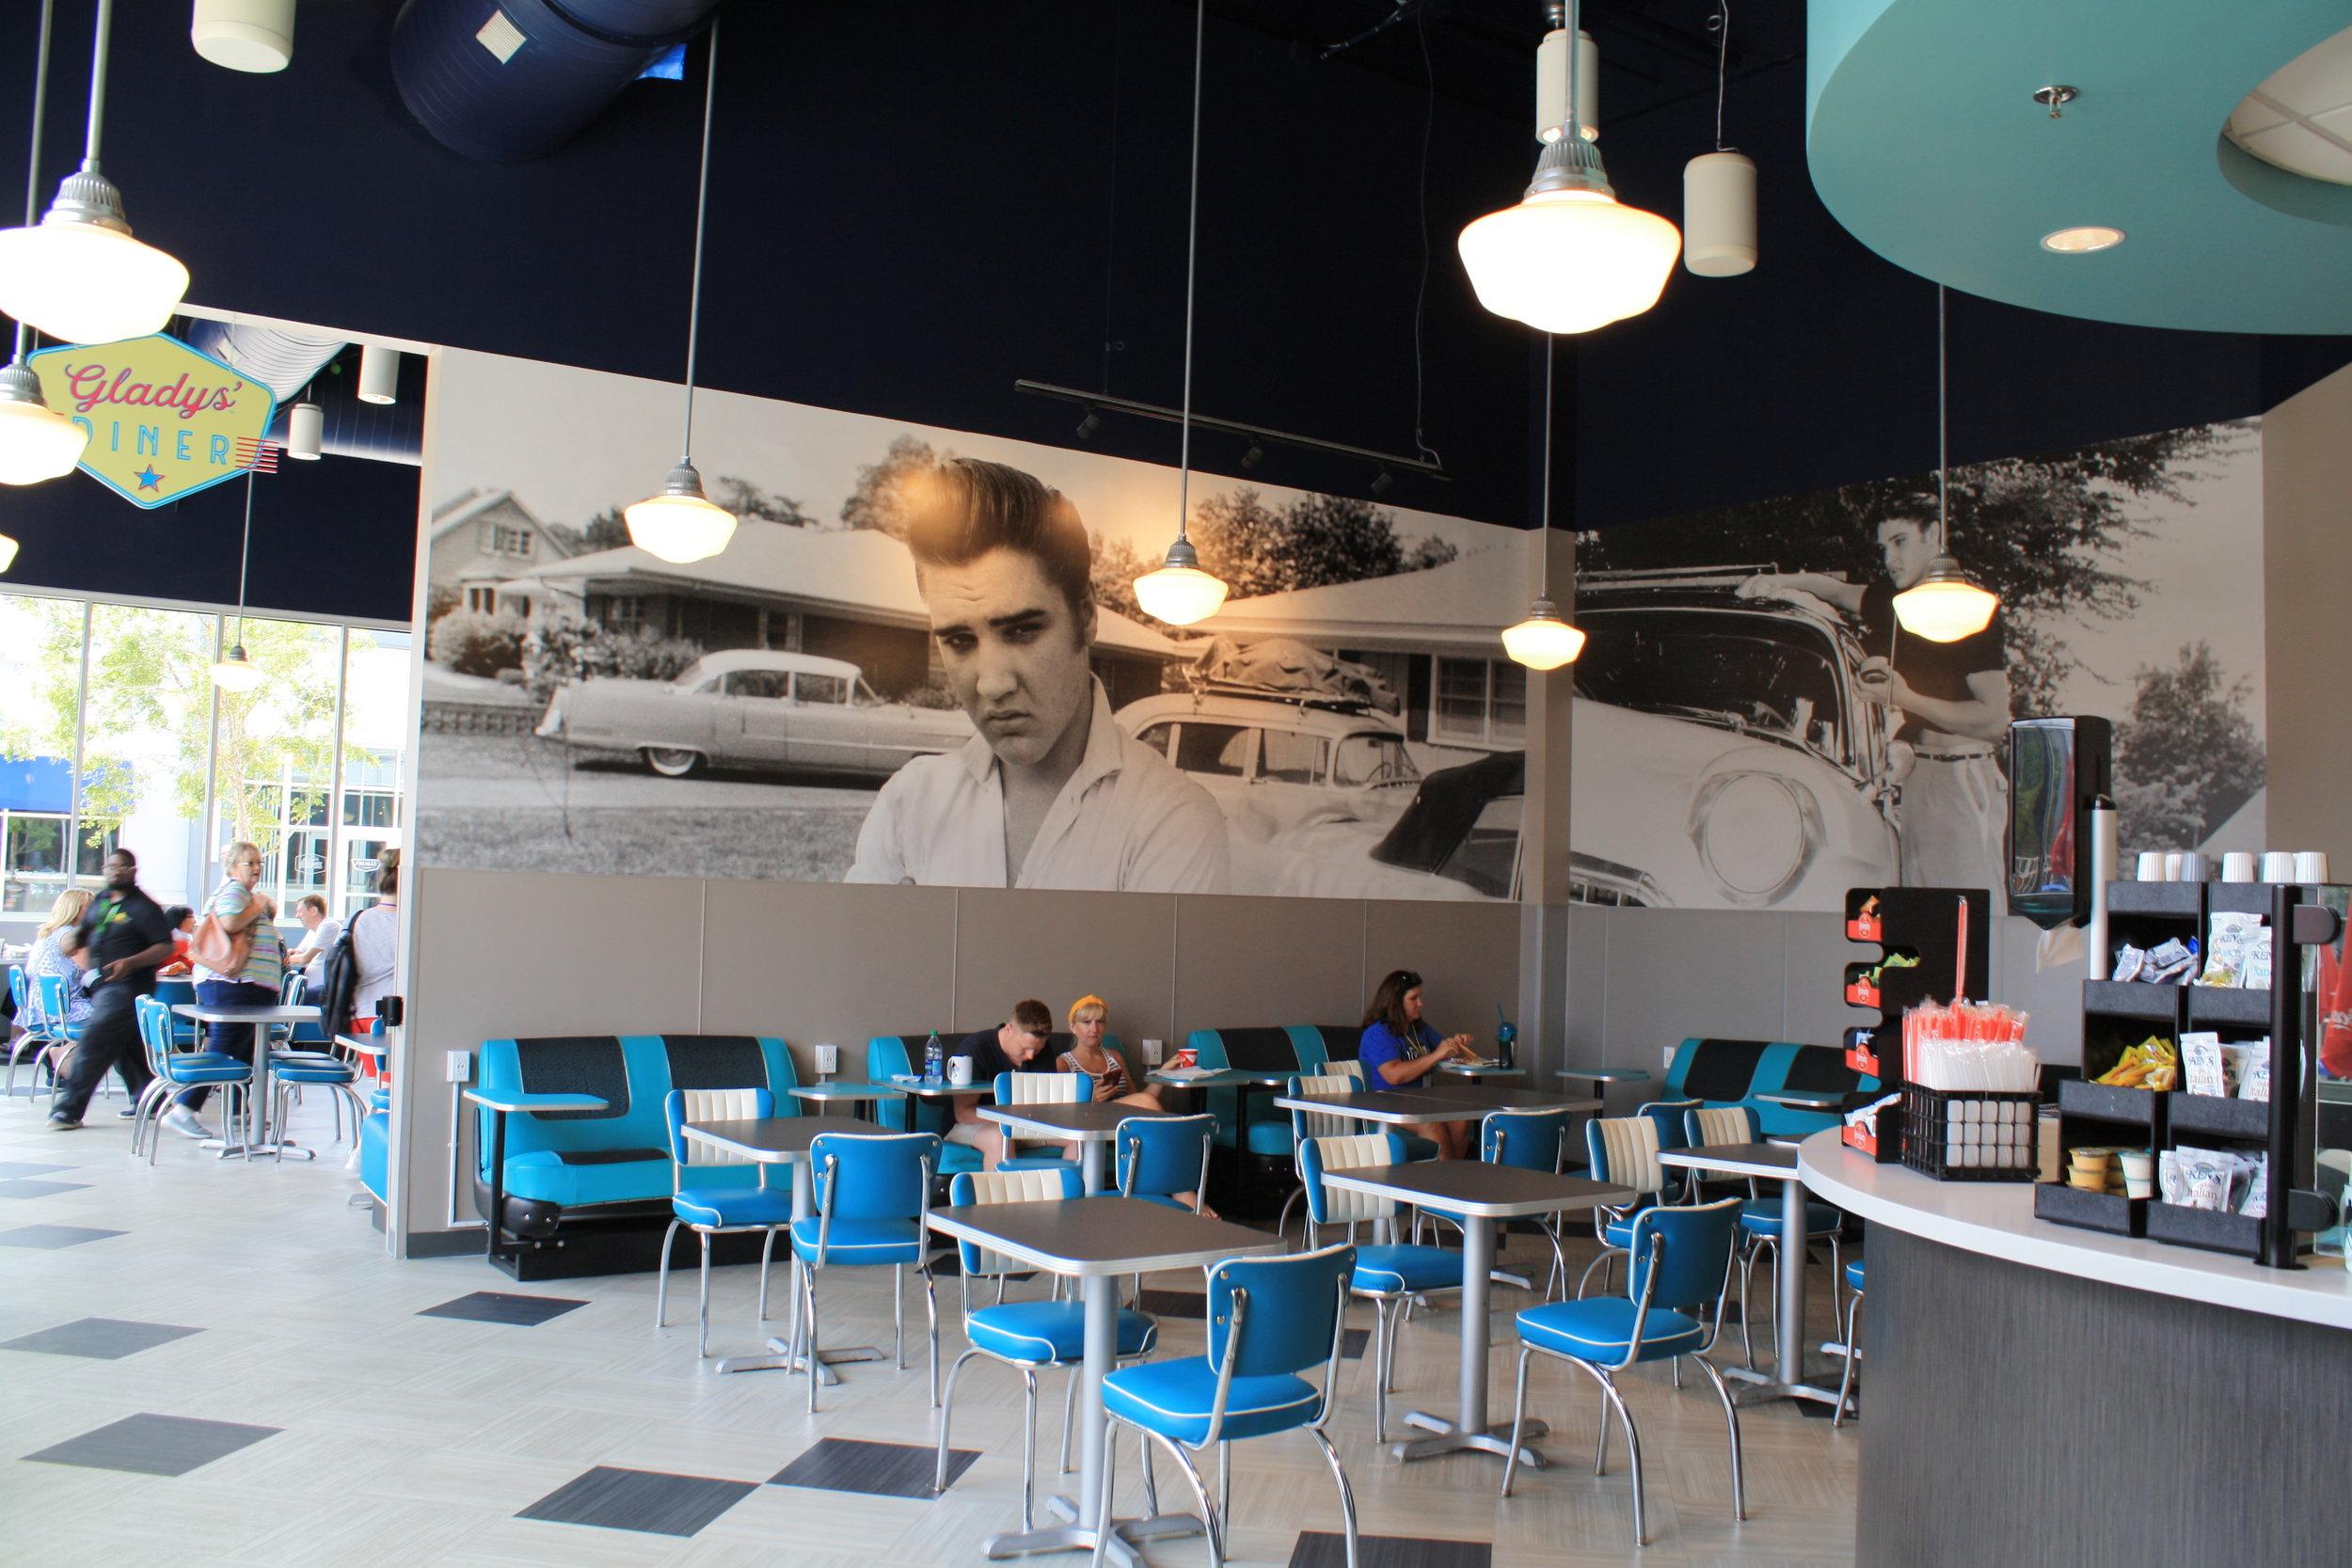 Graceland_Restaurant_LSIGraphics_Memphis-TN-1 ..